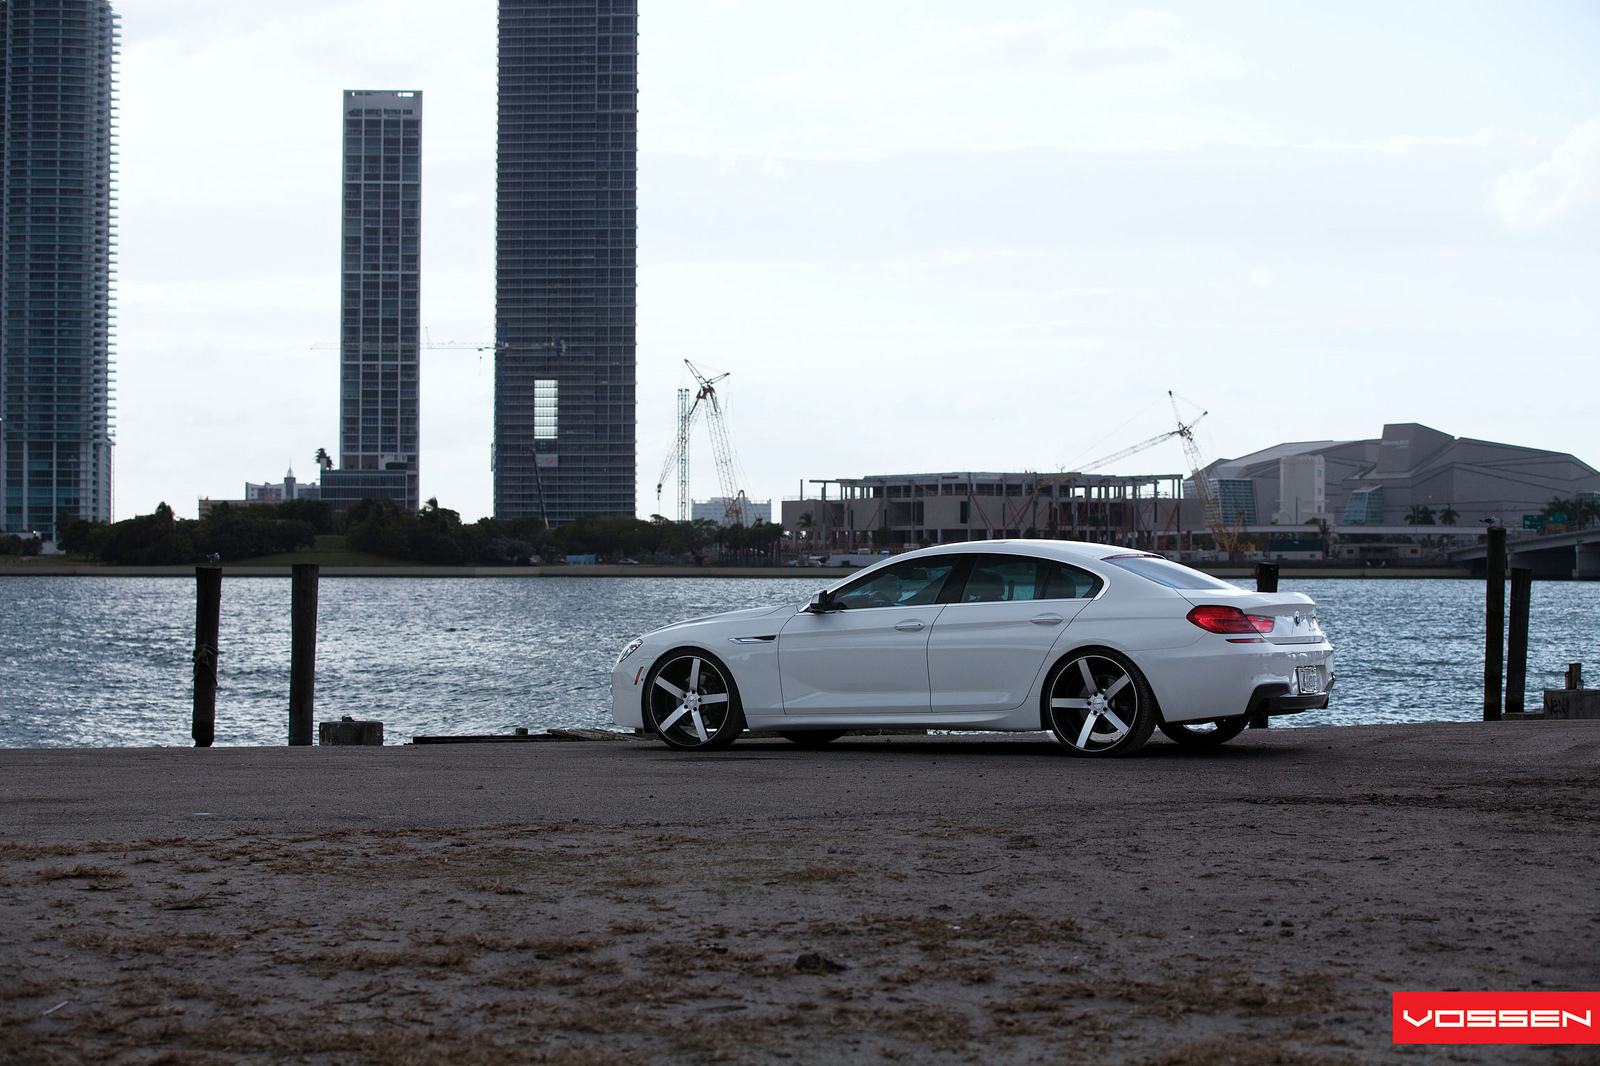 BMW 6 Series Gran Coupe on Vossen Wheels